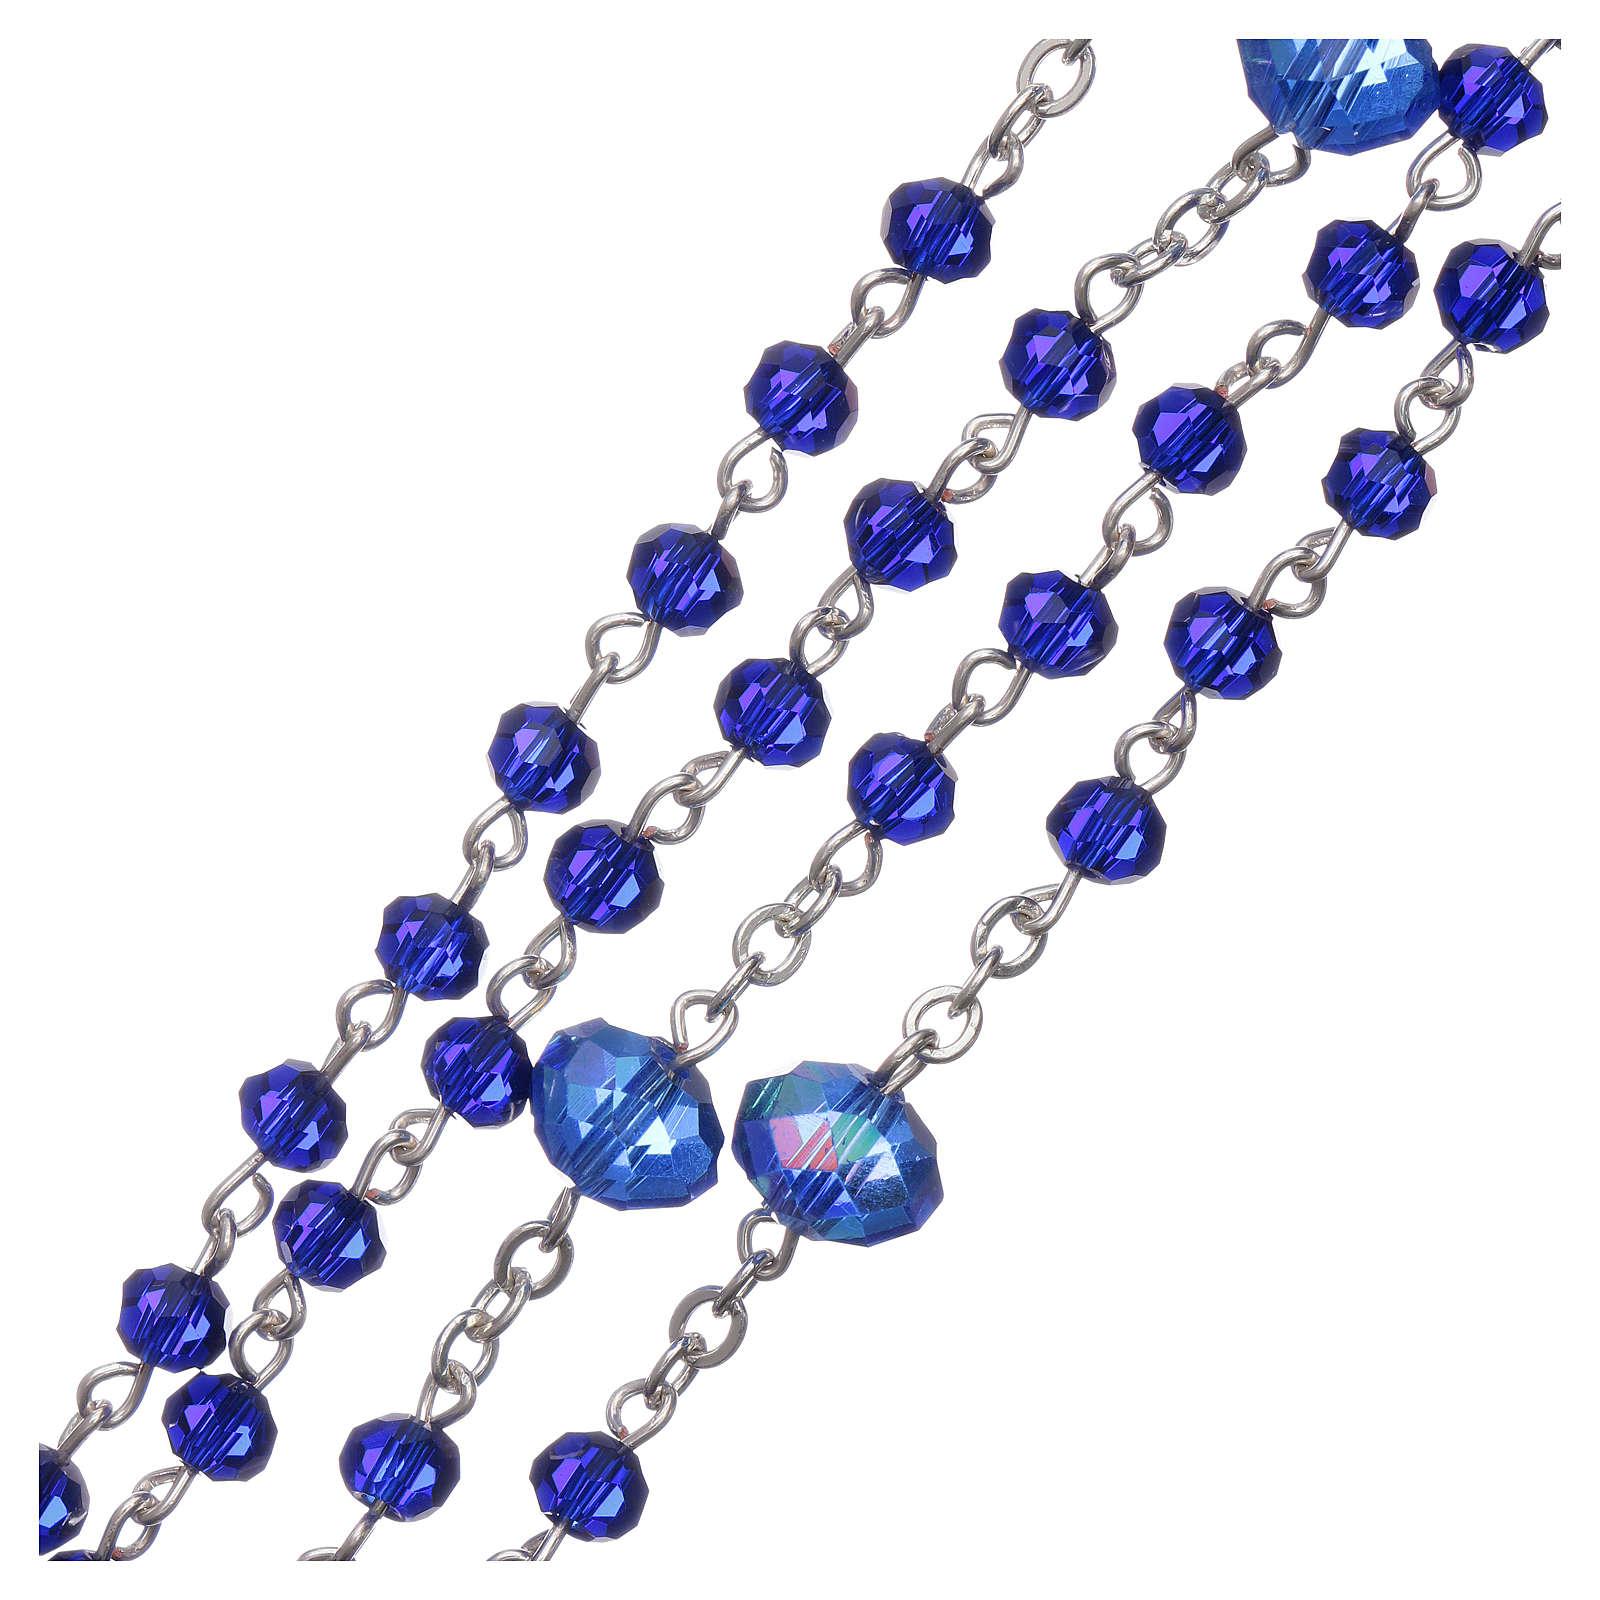 Coronilla Medjugorje cristal azul 4 mm 4